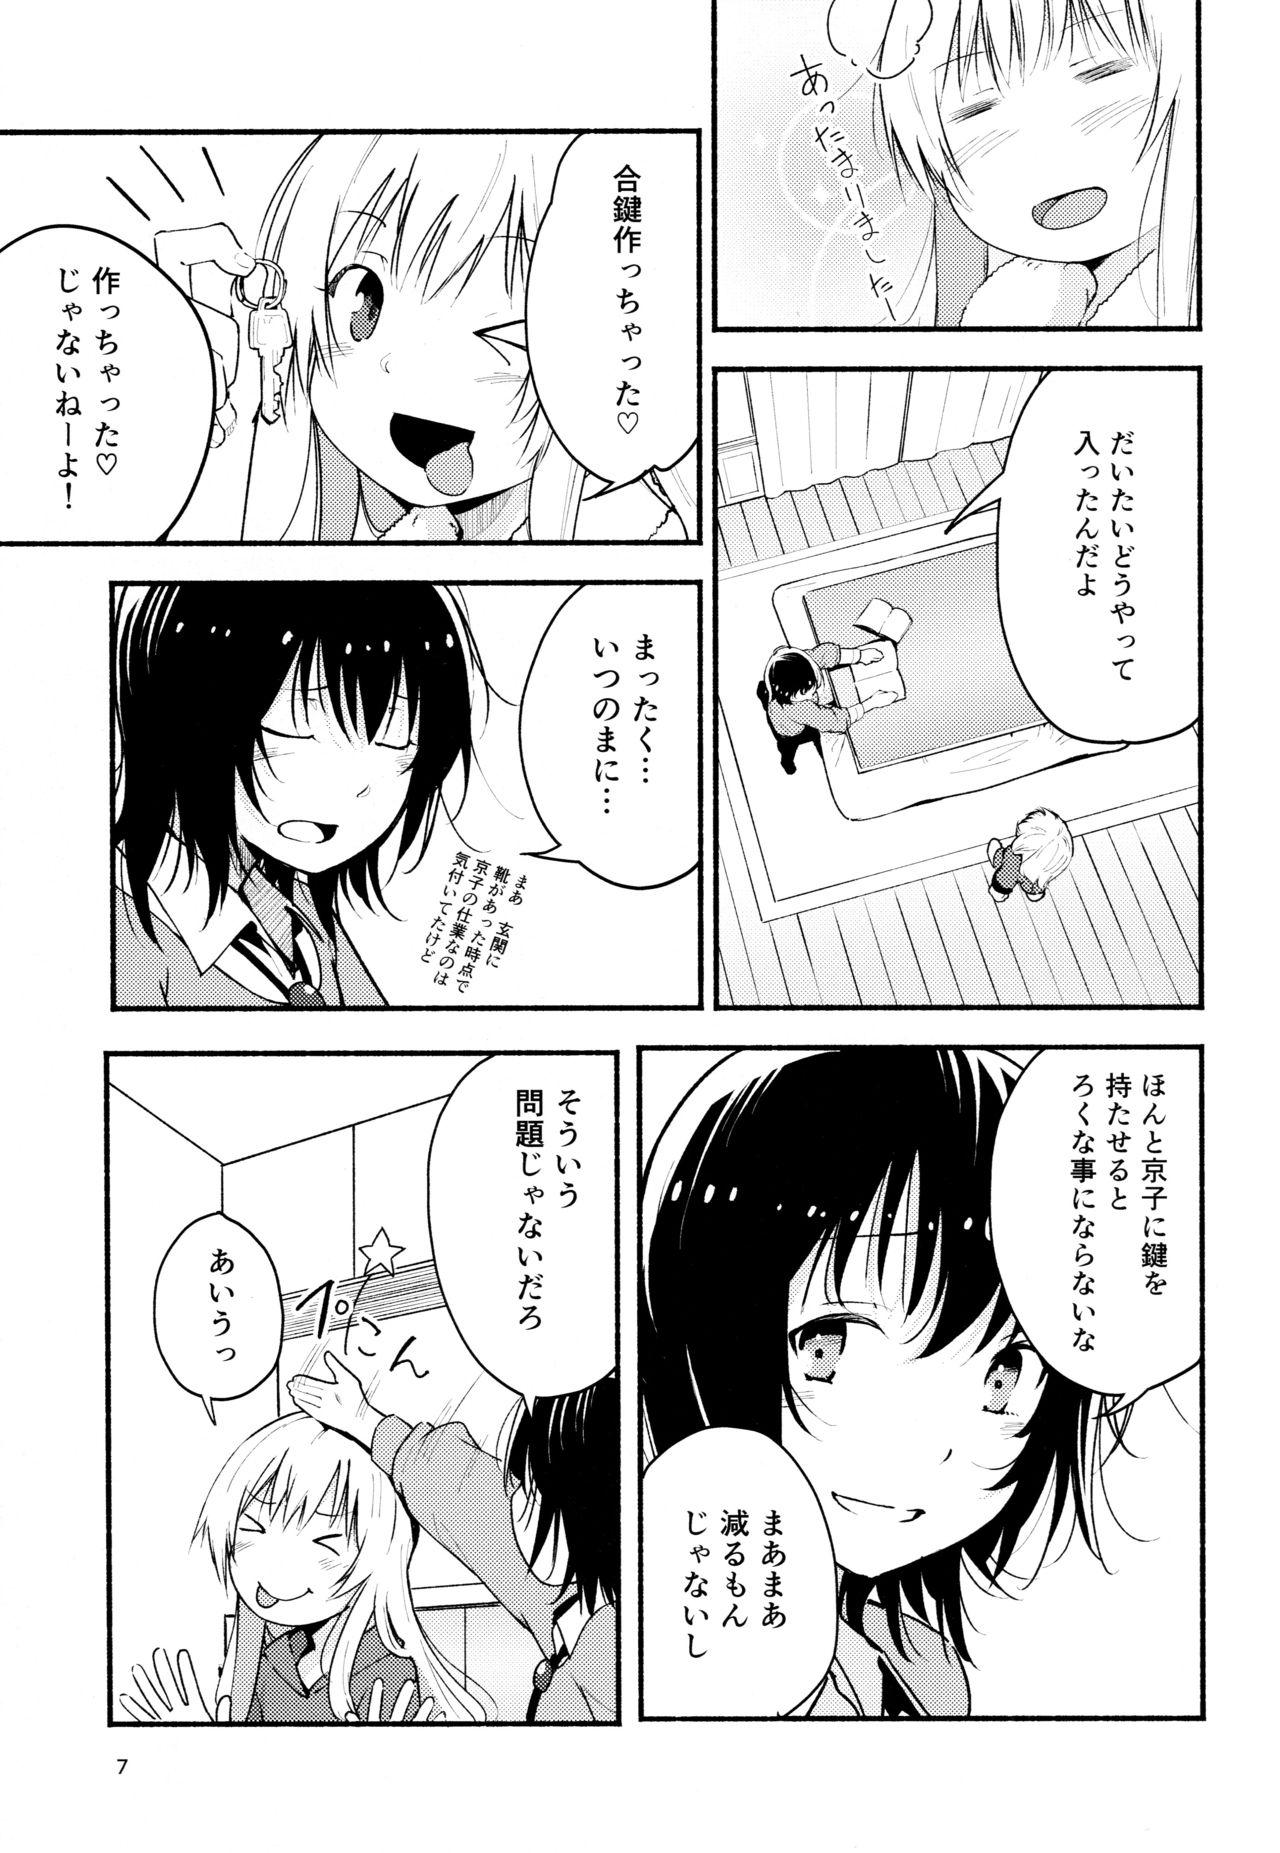 (Girls Love Festival 16) [G-complex (YUI_7)] Kyou mo Ashita mo Yurui Hibi o - Yui and Kyoko and forever loose day-to-day (YuruYuri) 5